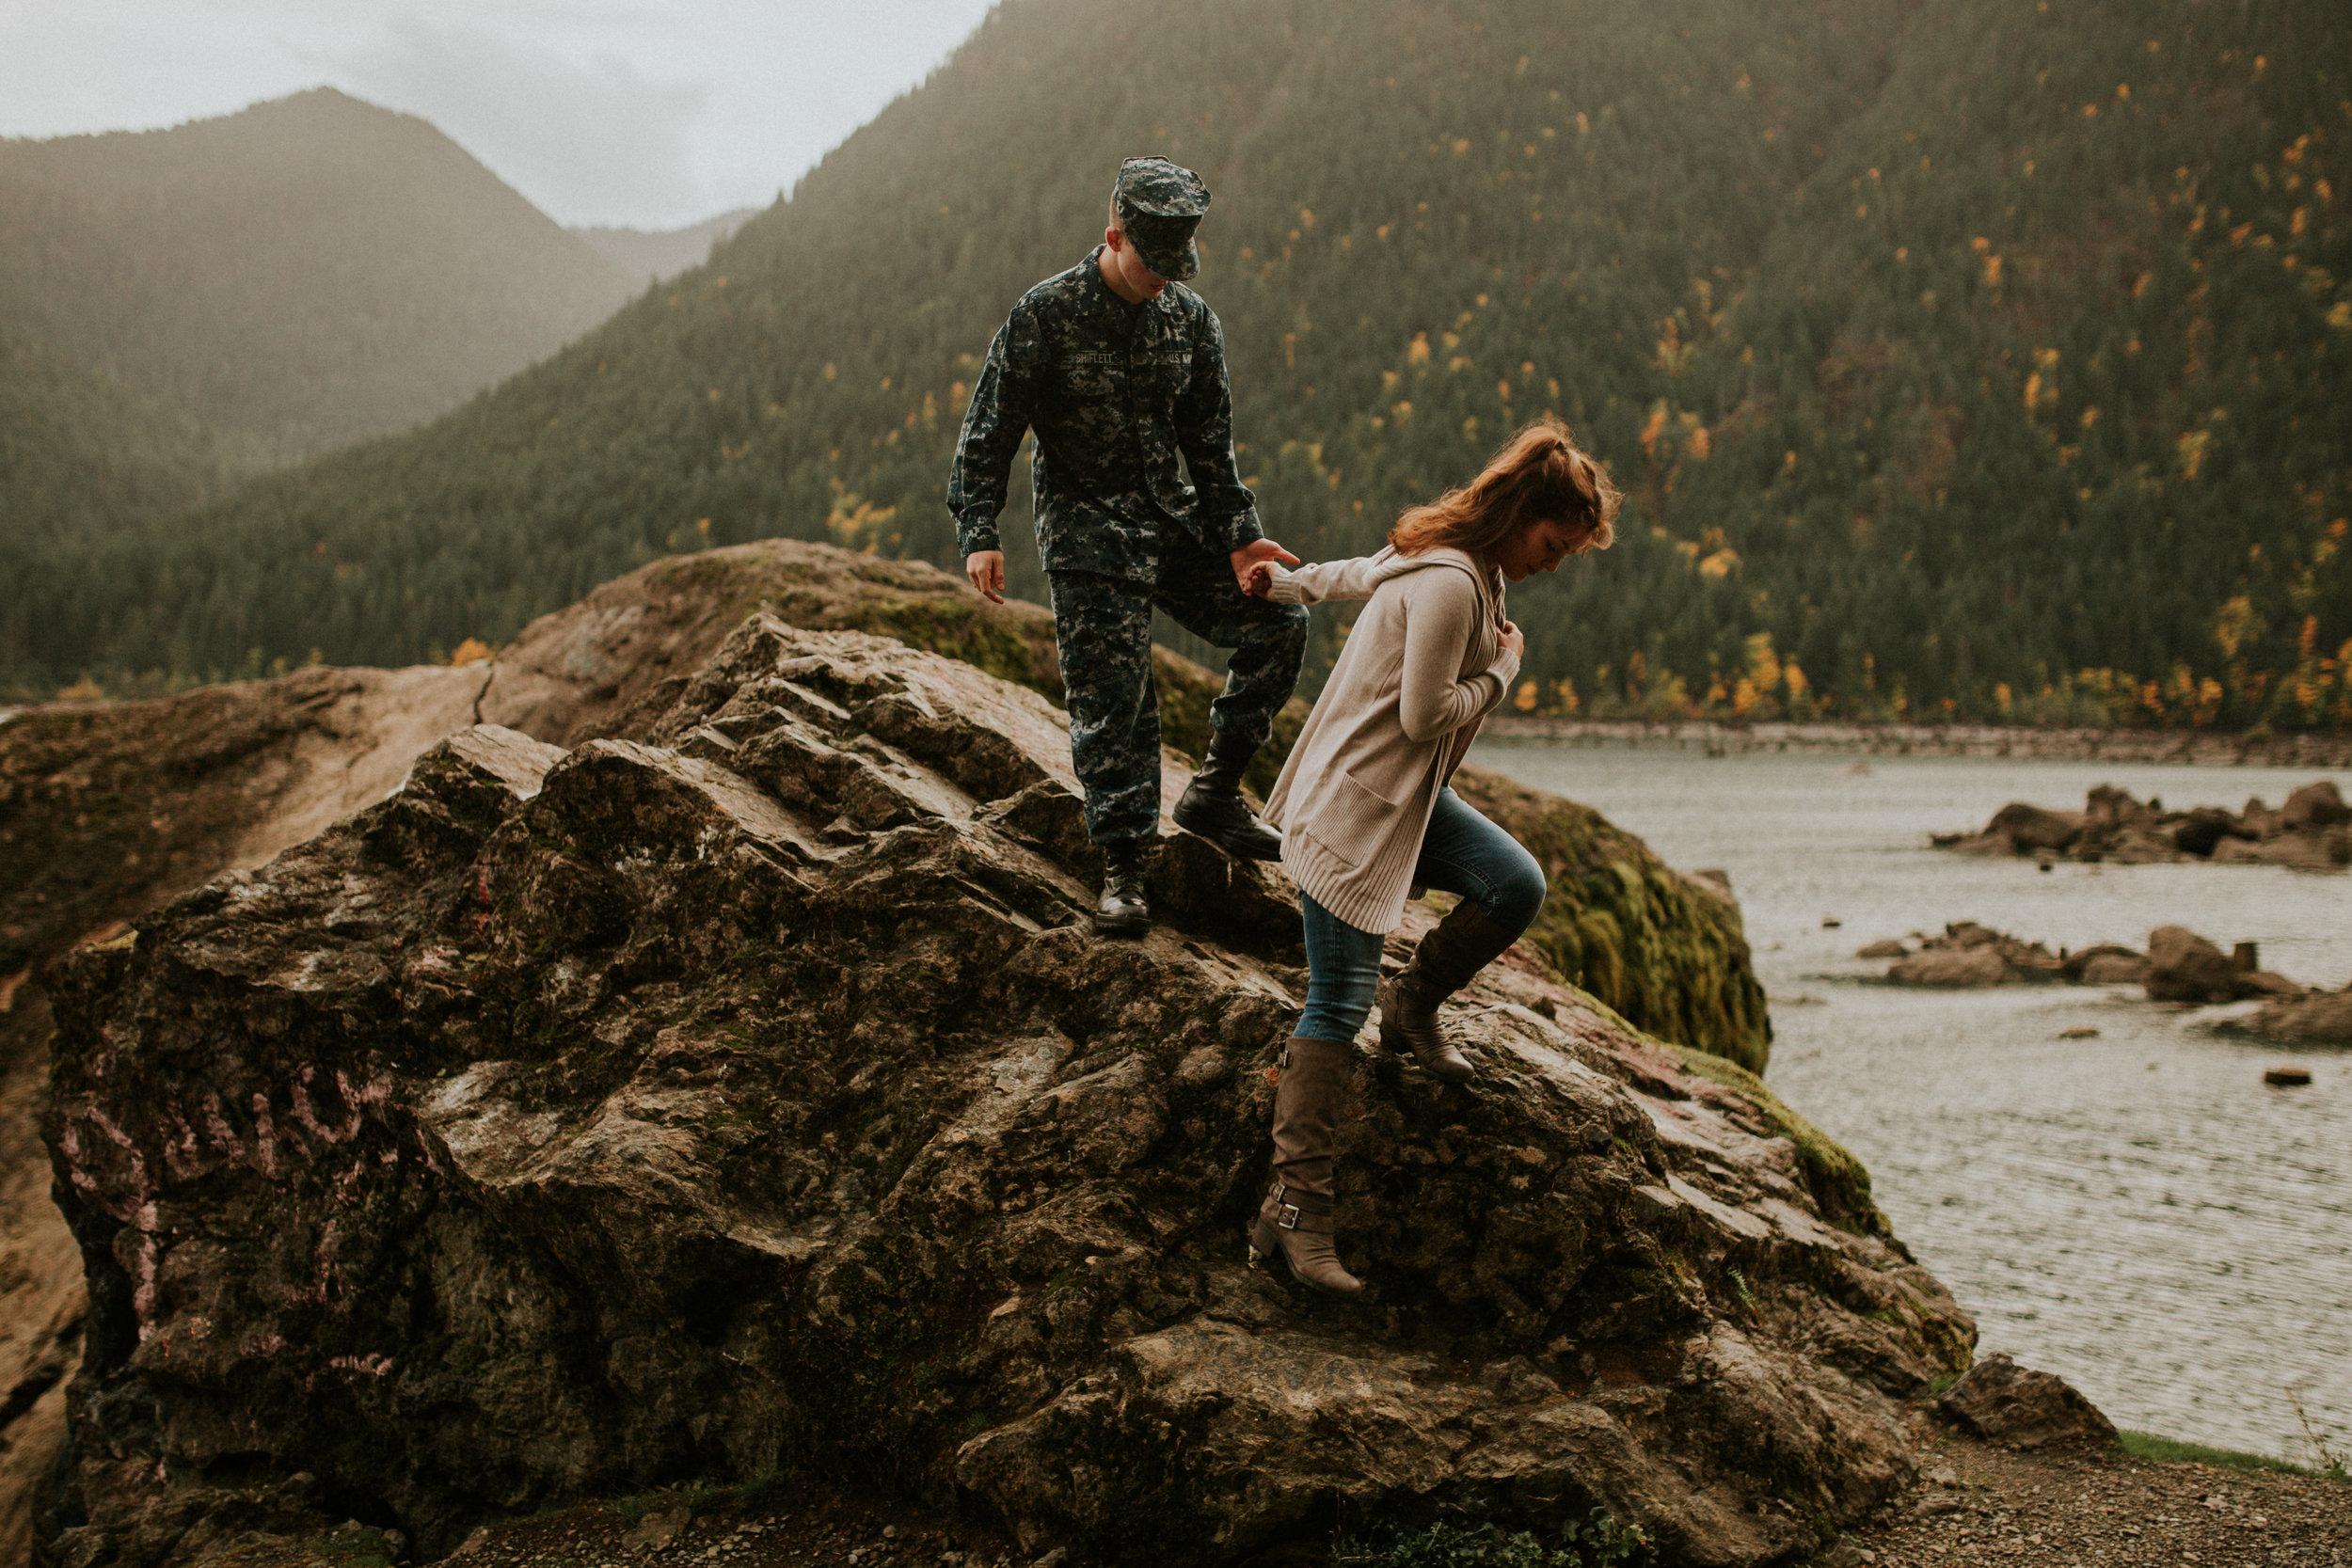 Lake-Cushman-Adventure-Engagement-photographer-breeanna-lasher-77.jpg